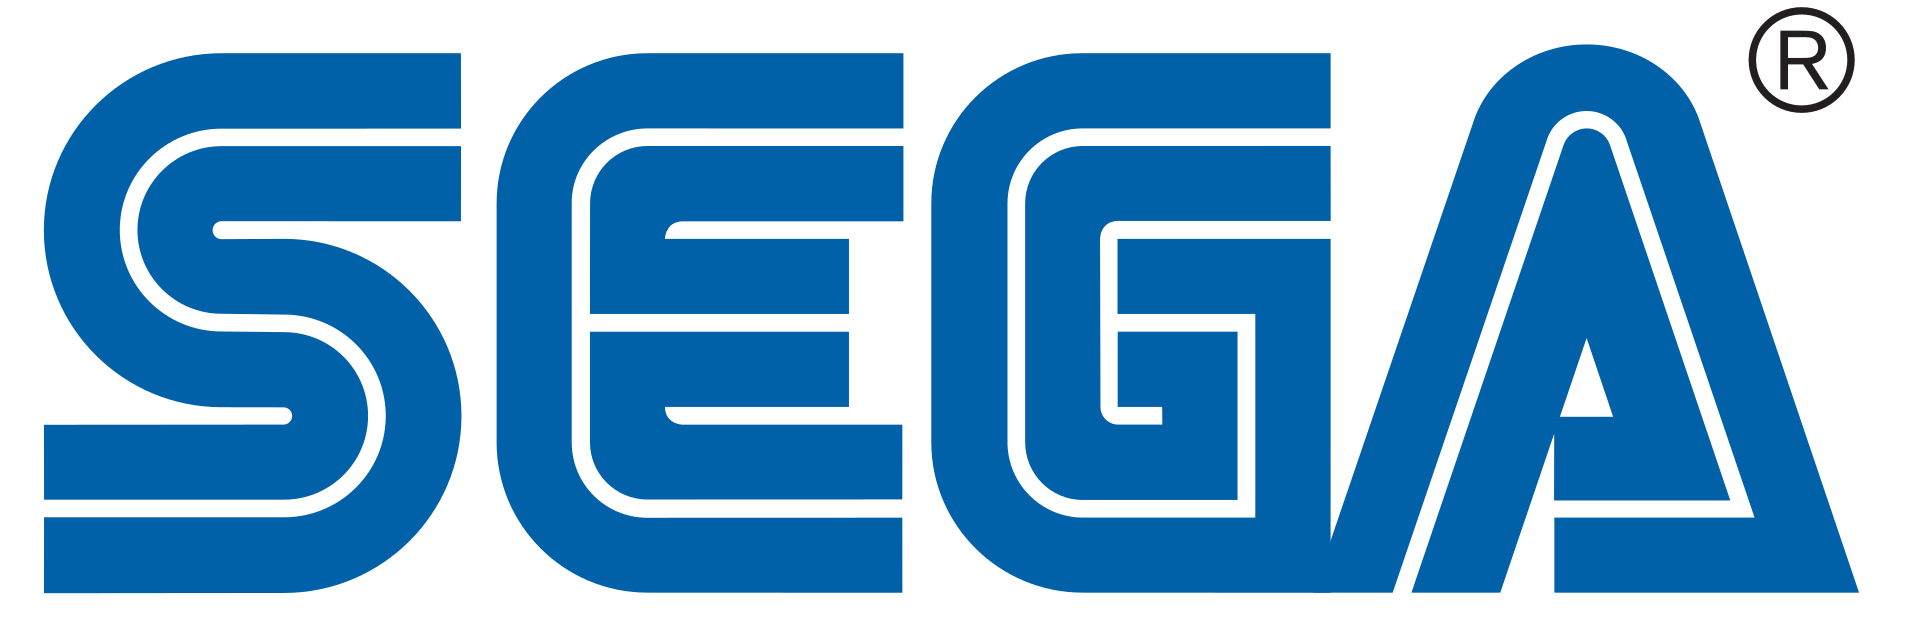 langfr-1920px-SEGA_logo-svg.png